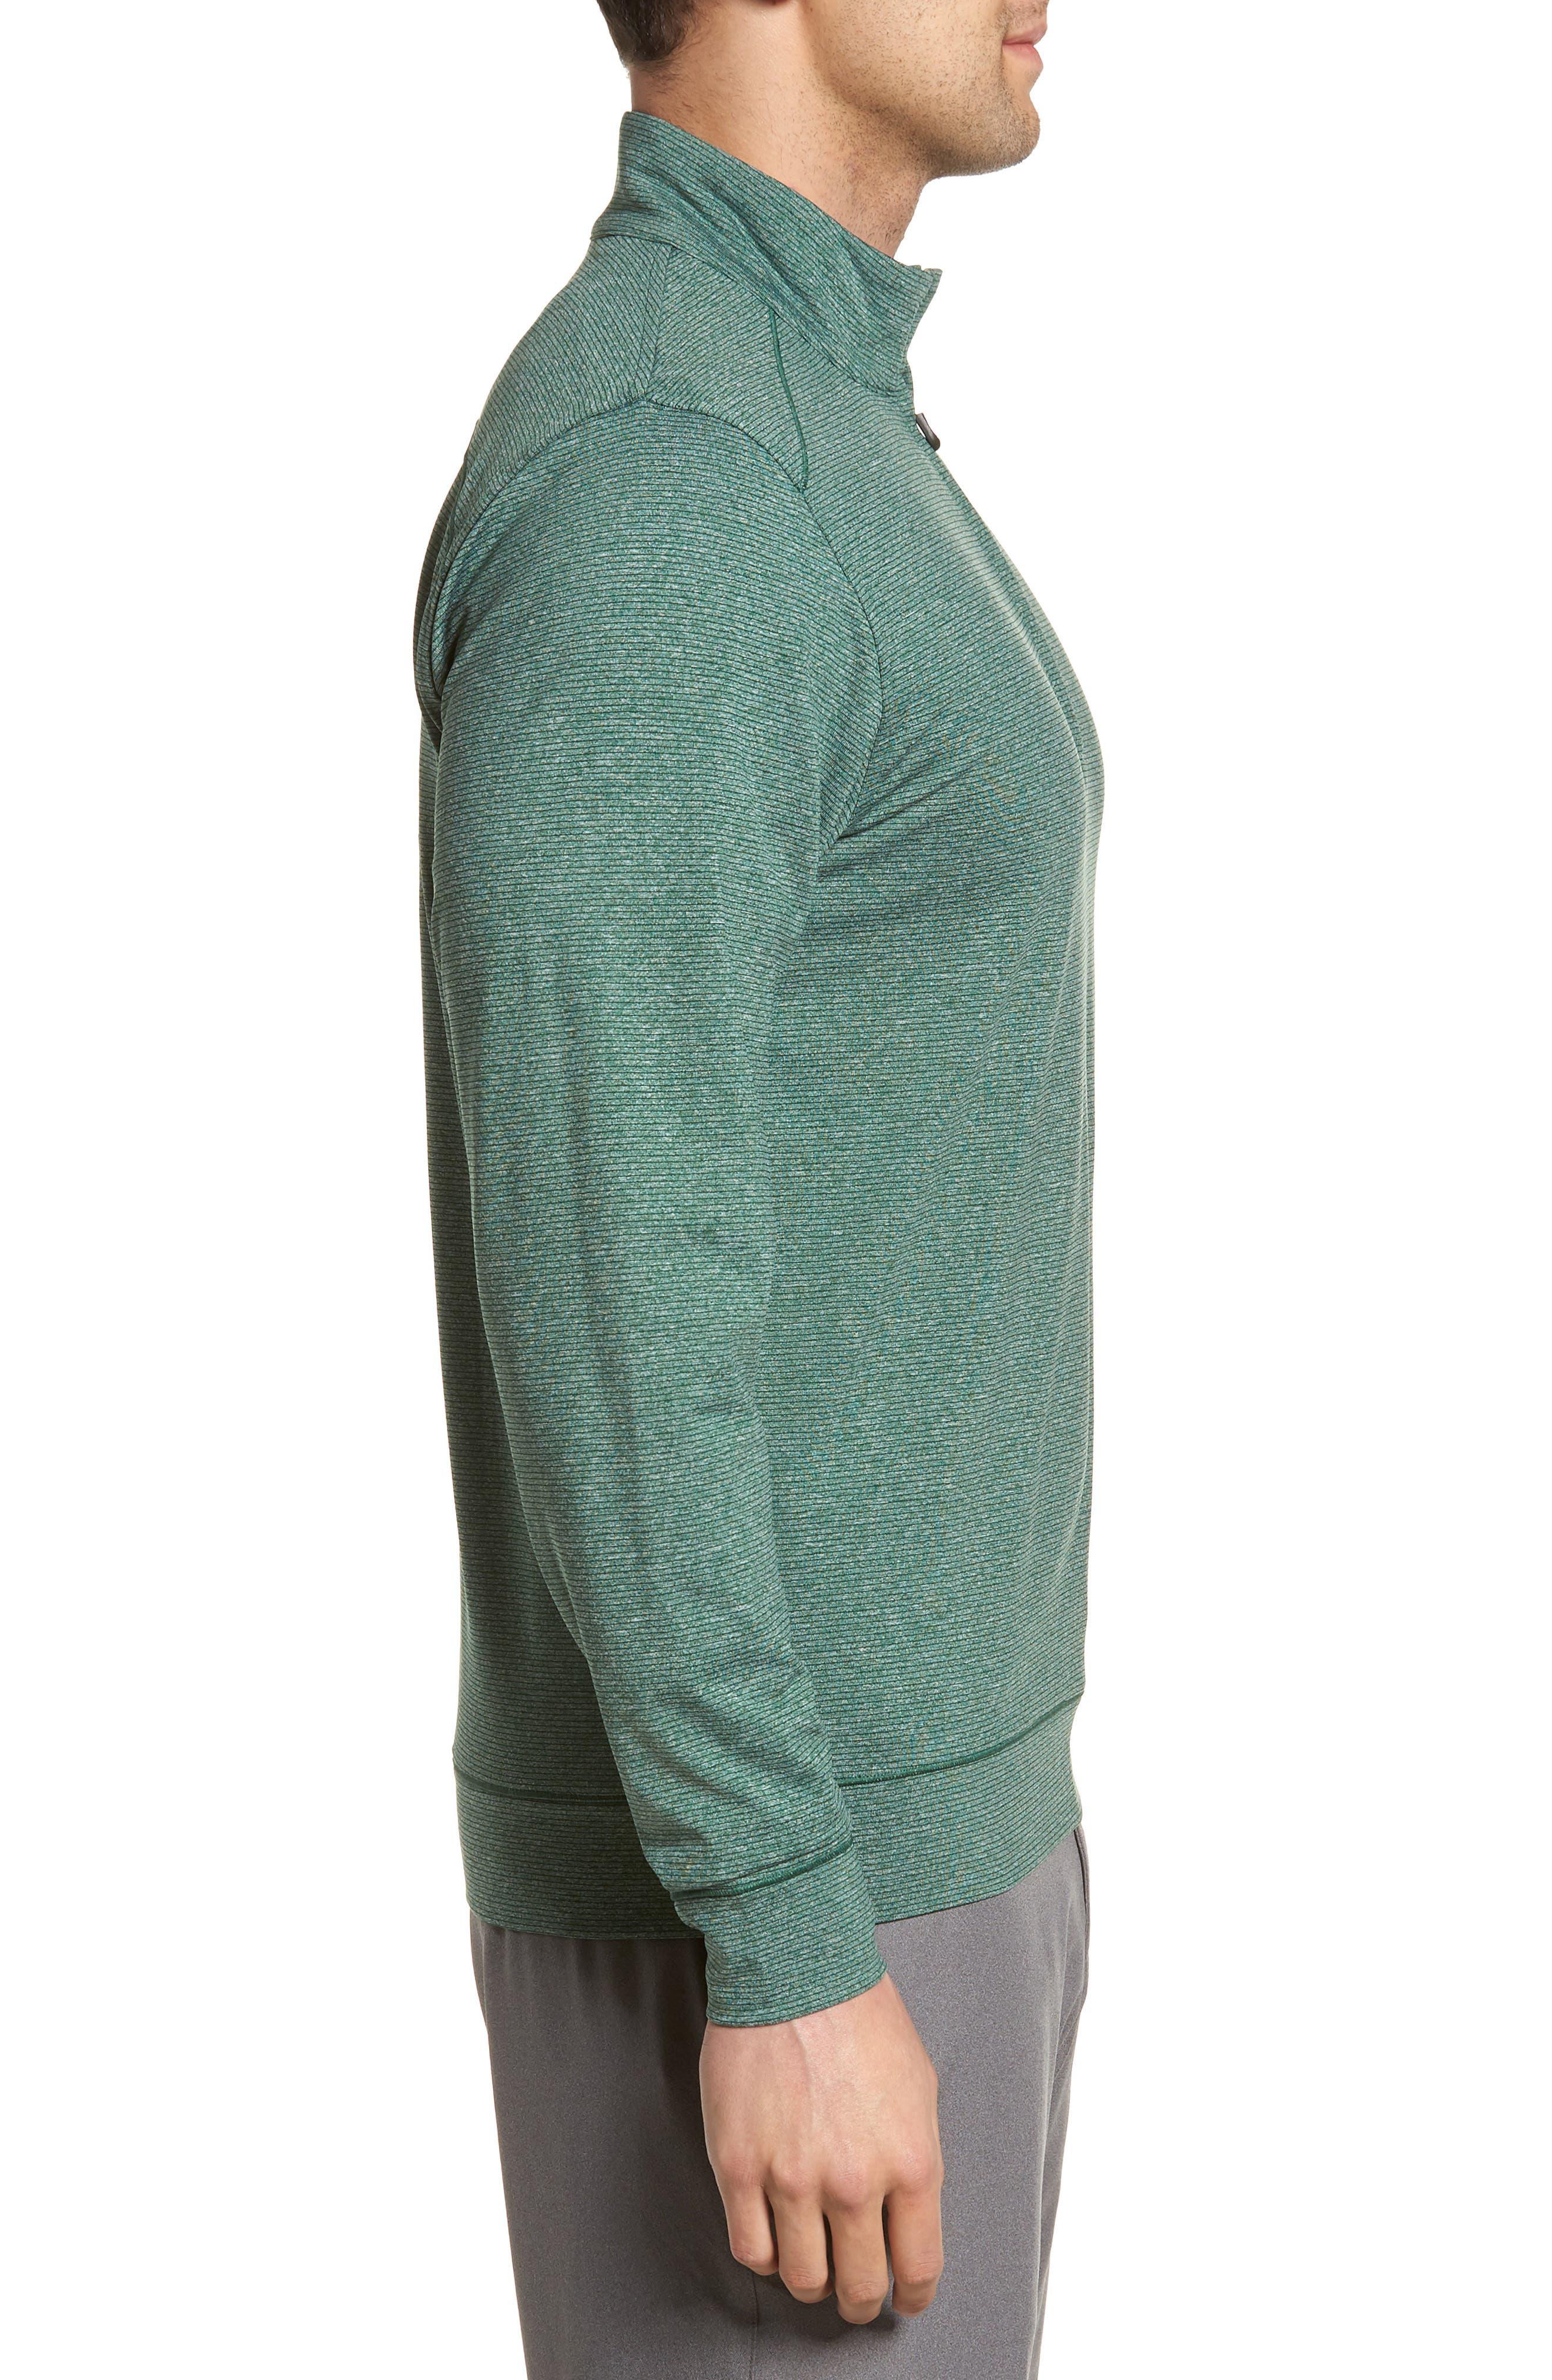 CUTTER & BUCK, Shoreline Classic Fit Half Zip Pullover, Alternate thumbnail 3, color, HUNTER HEATHER